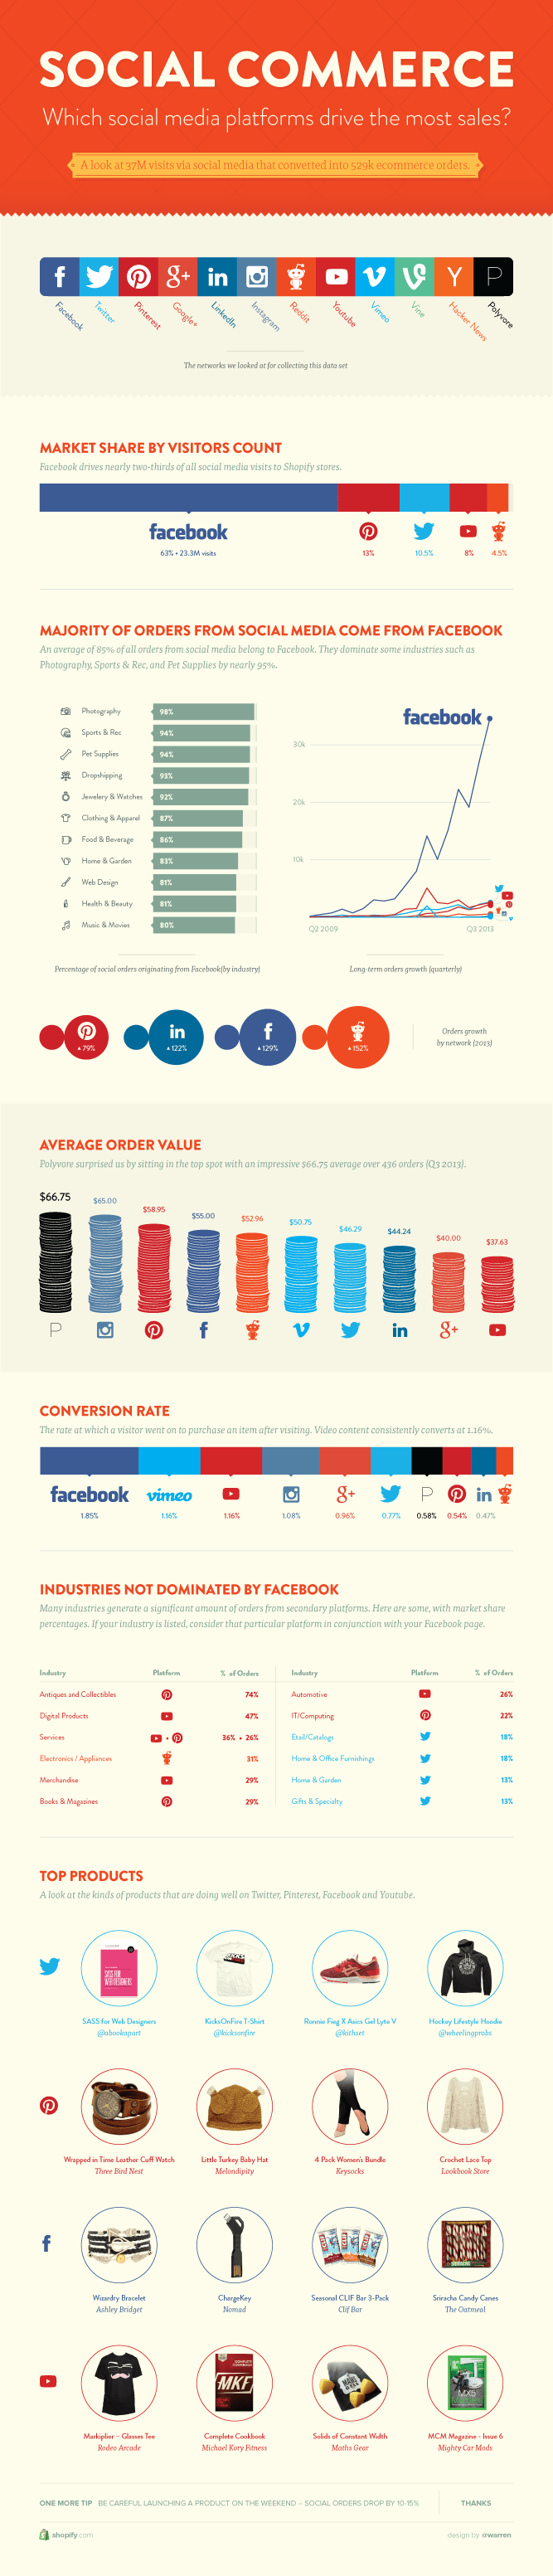 importancia das redes sociais para o ecommerce